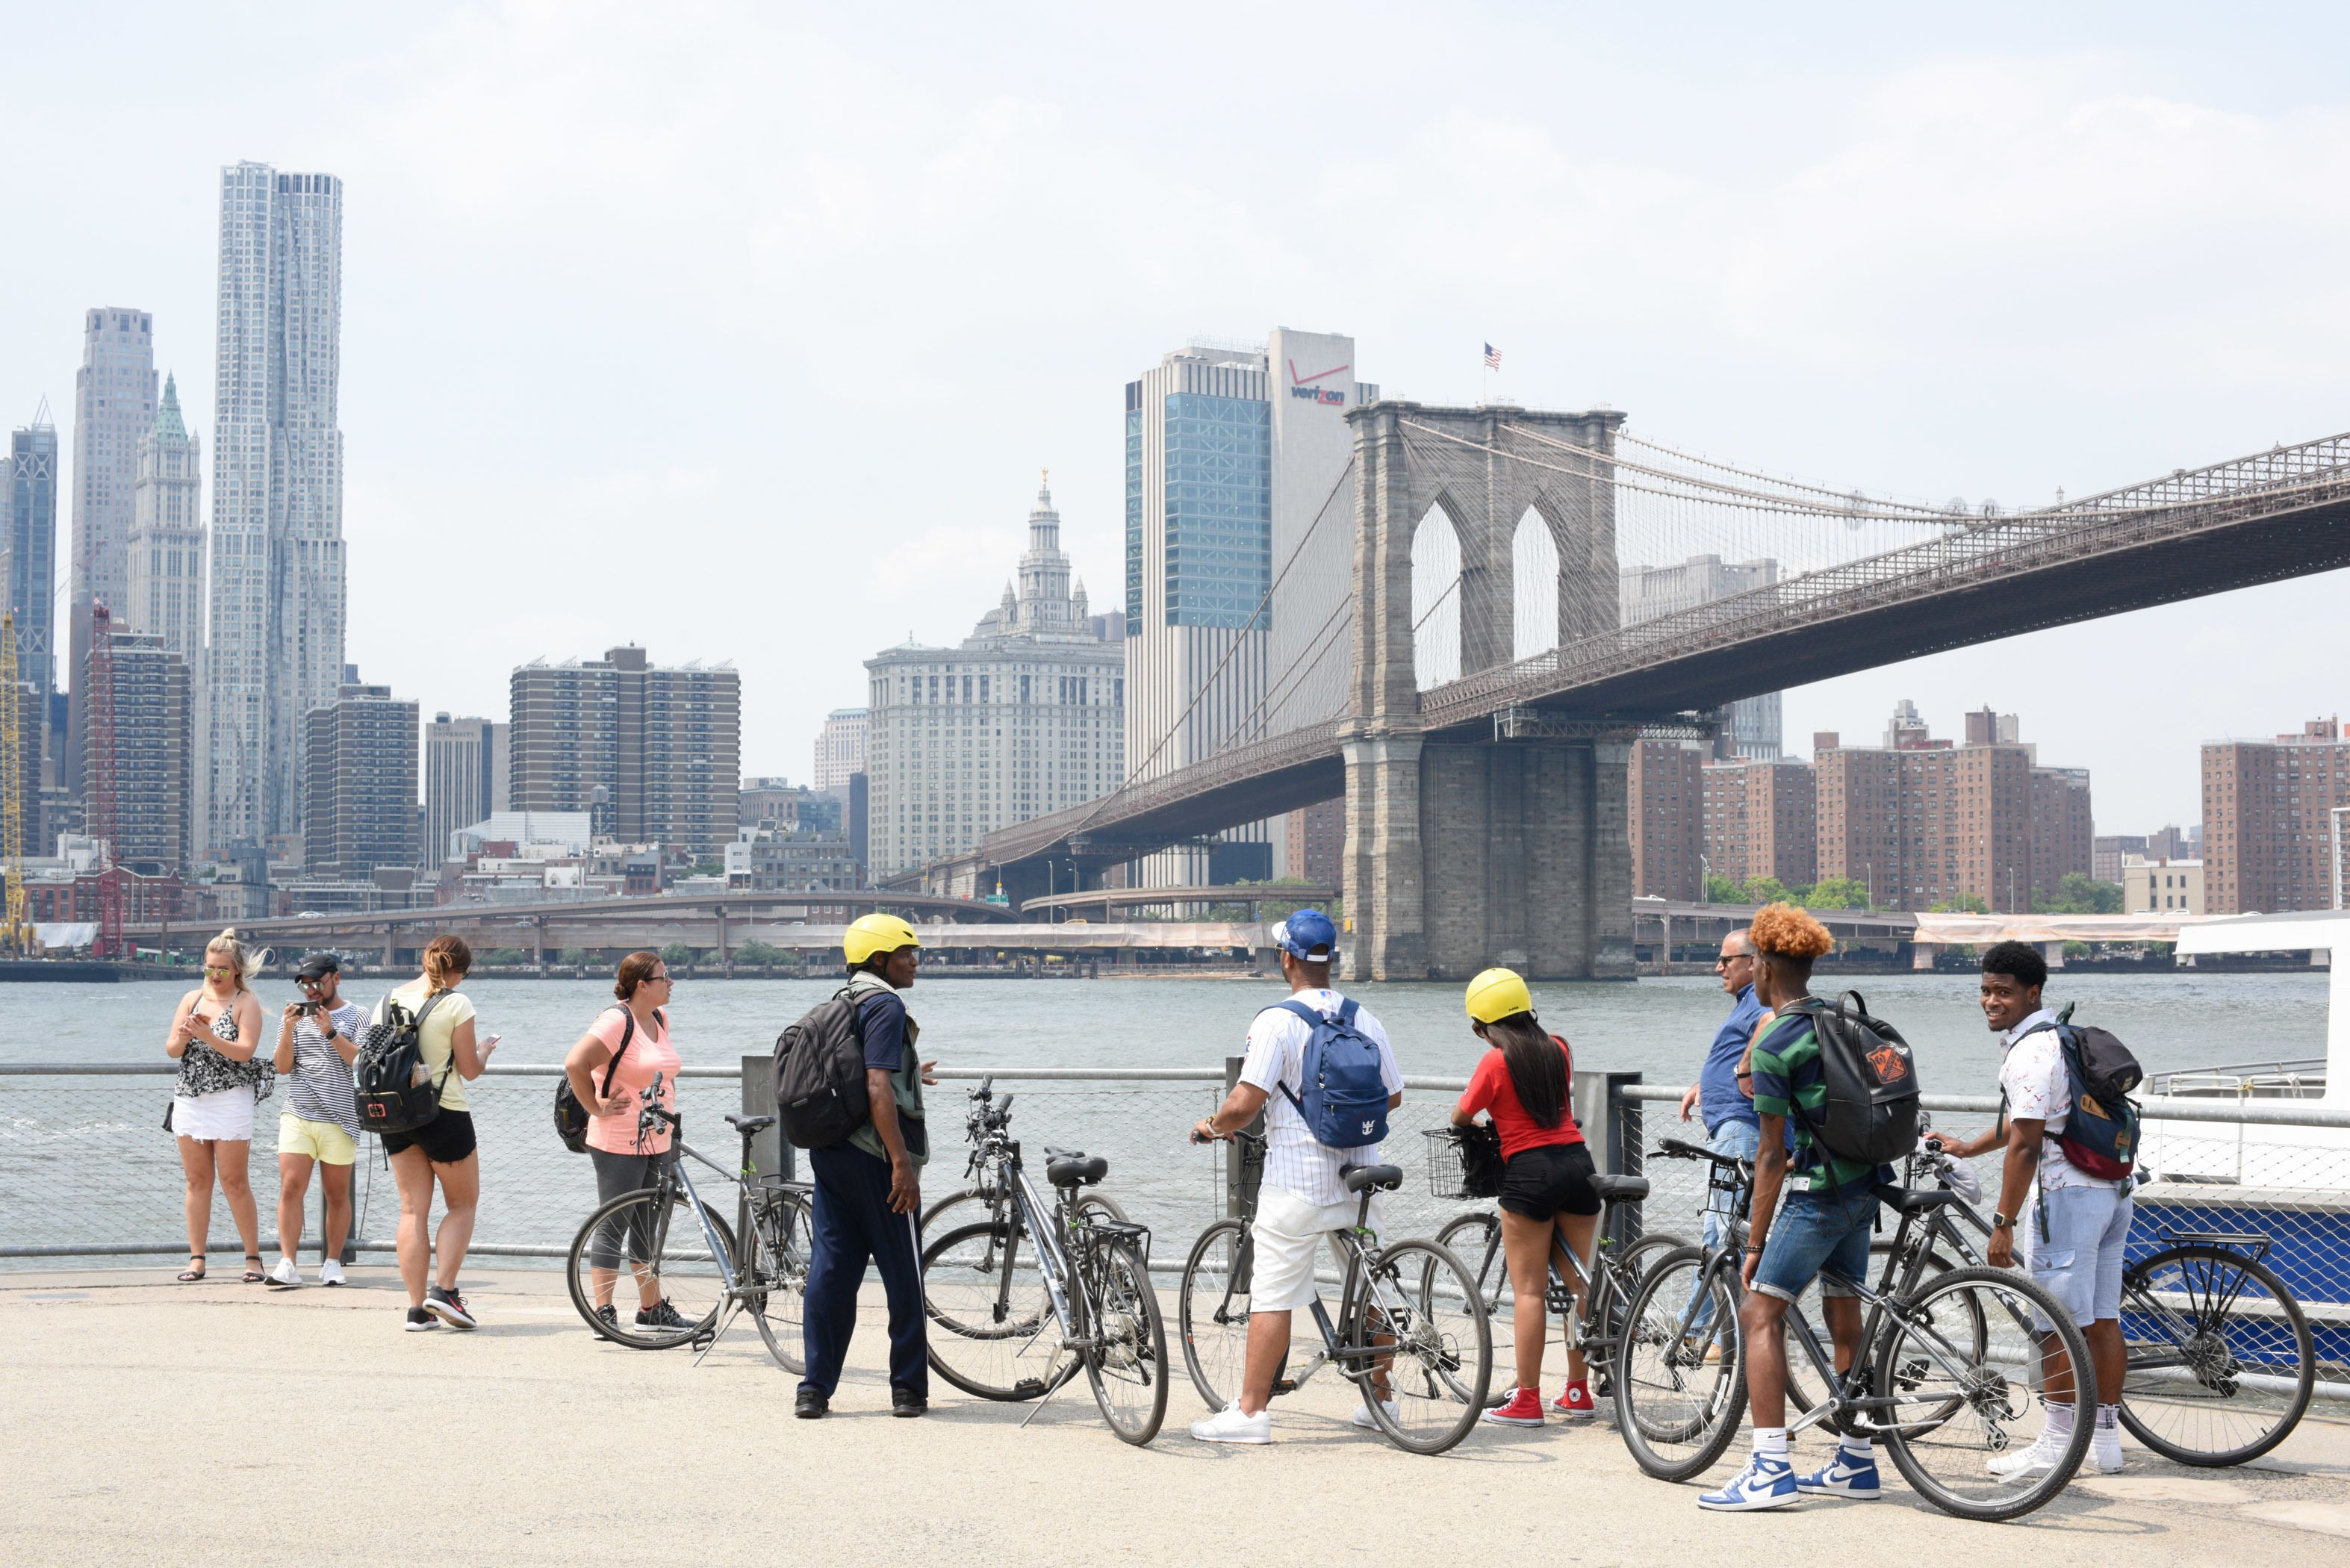 Live Guided Bike Tour of New York City's The Brooklyn Bridge